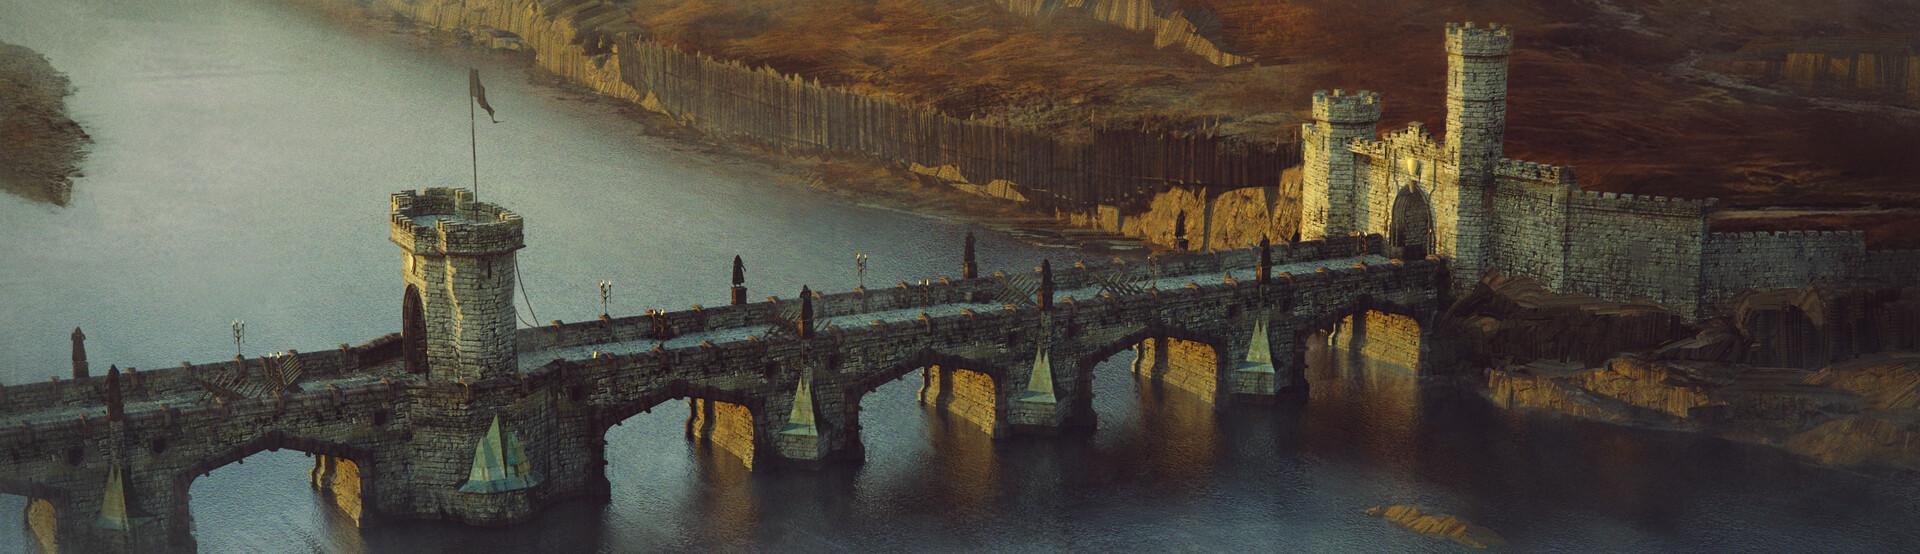 Jasza dobrzanski bridge design worked out final